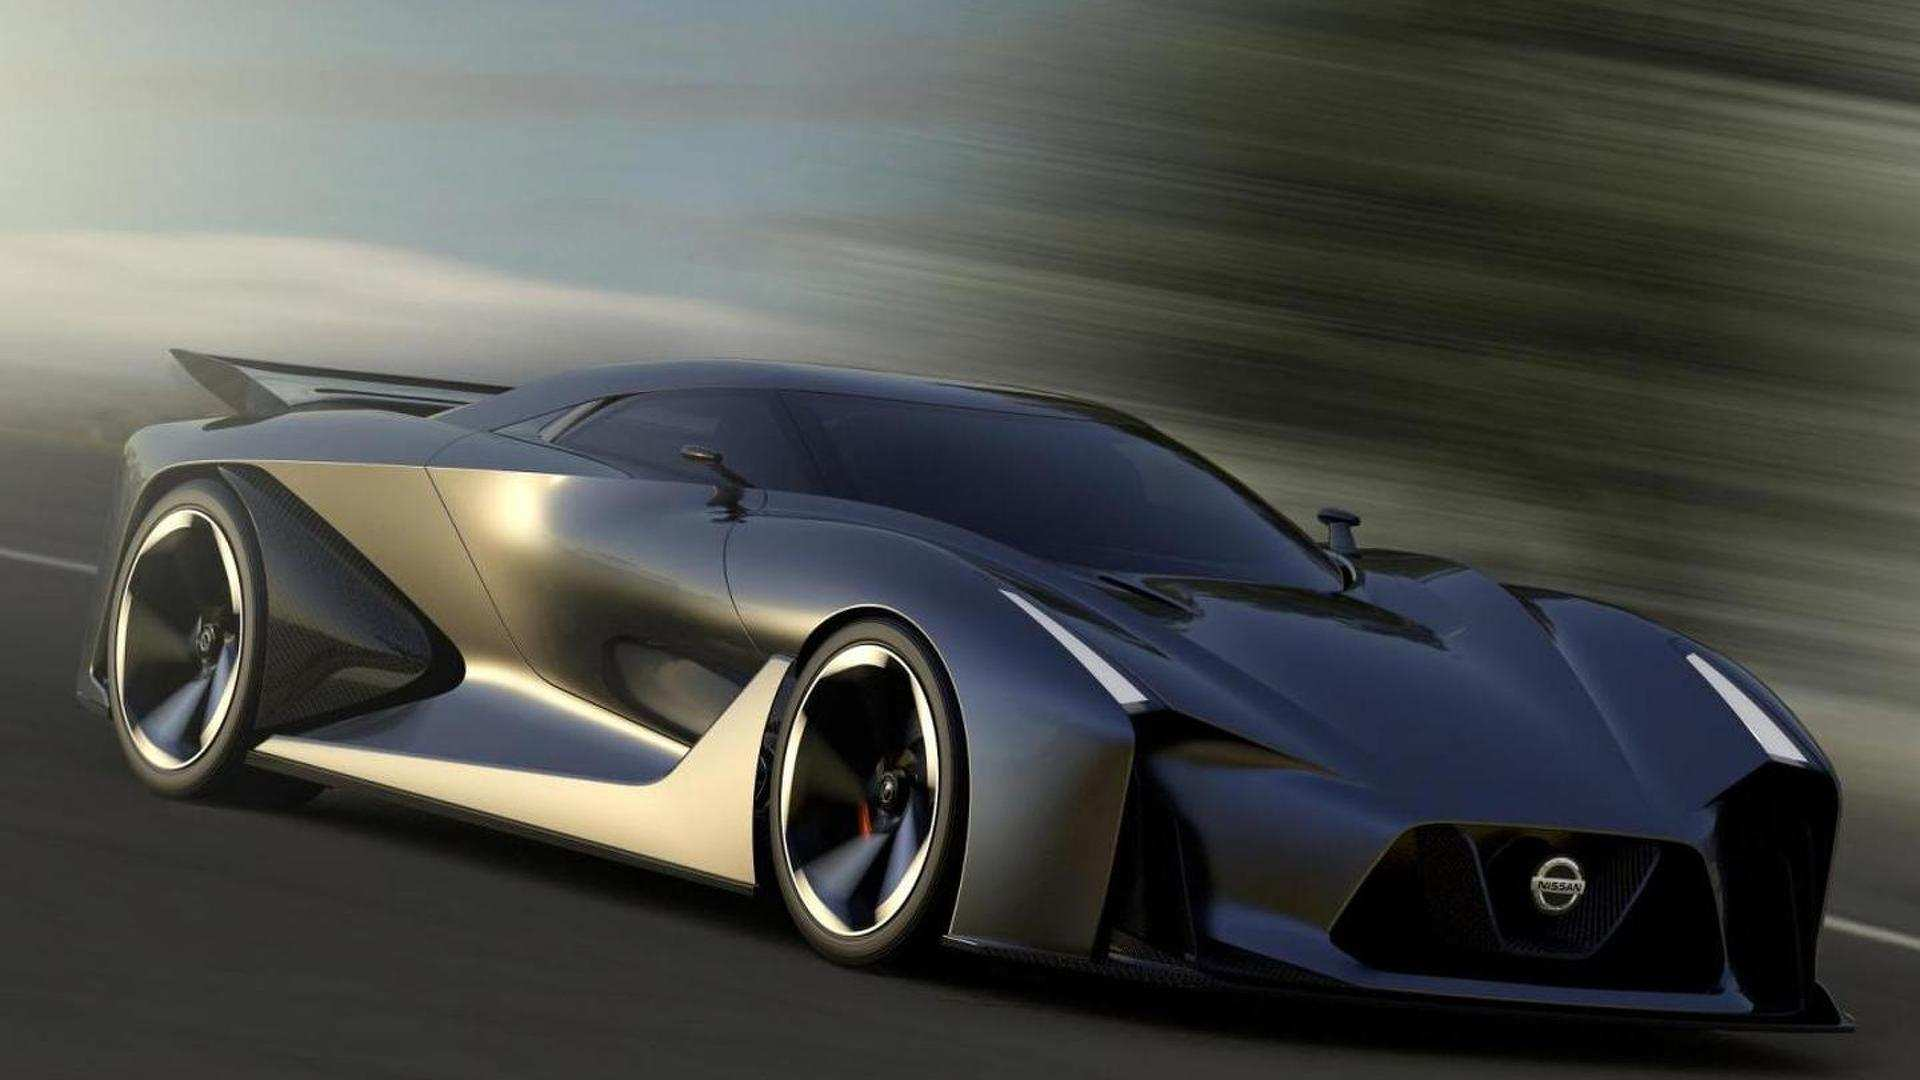 2020 Nissan Gtr Nismo Hybrid Overview